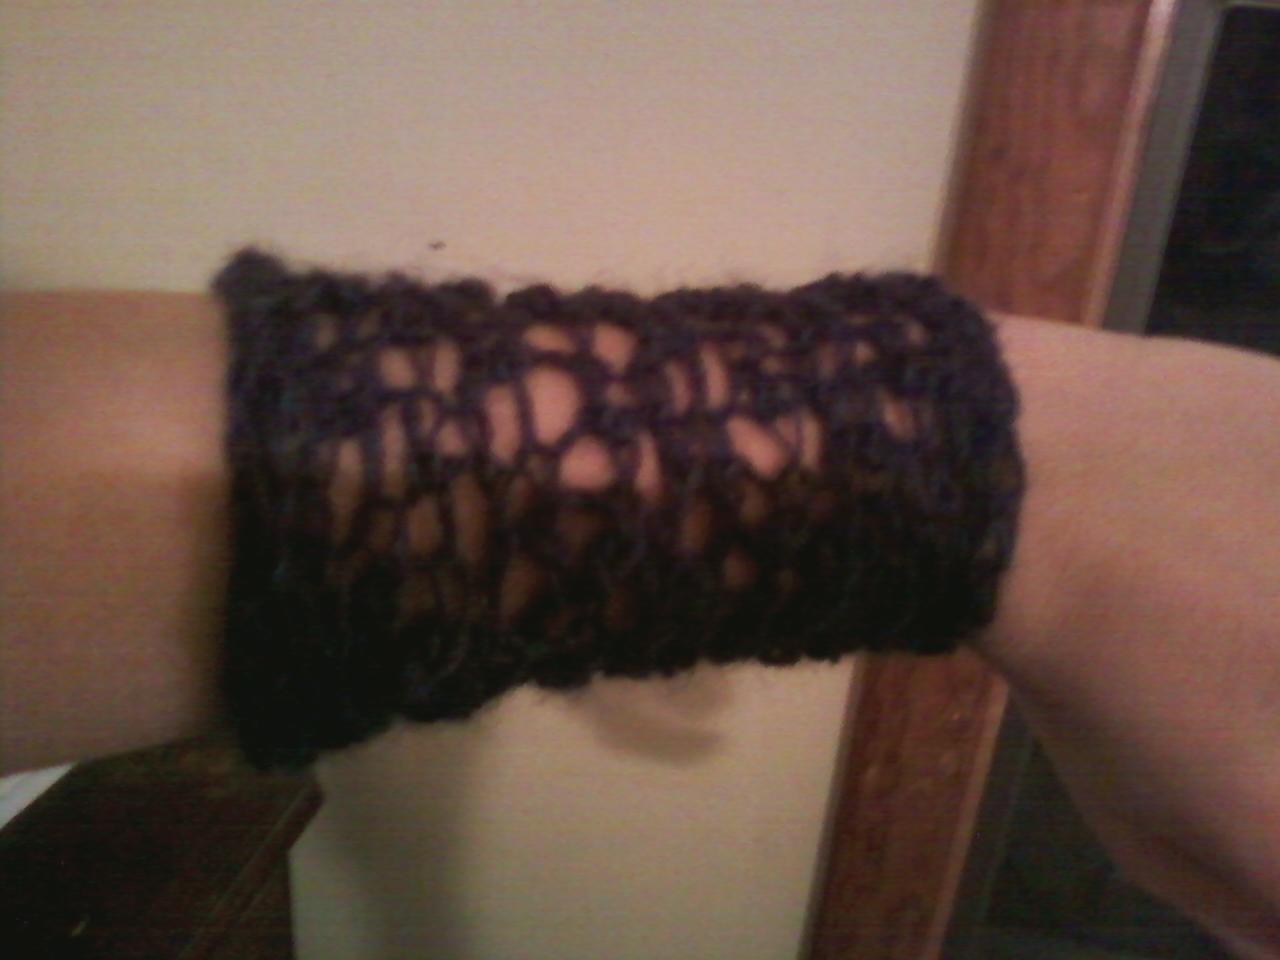 Knitting Yrn K2tog : The knitting otaku lacy armwarmers